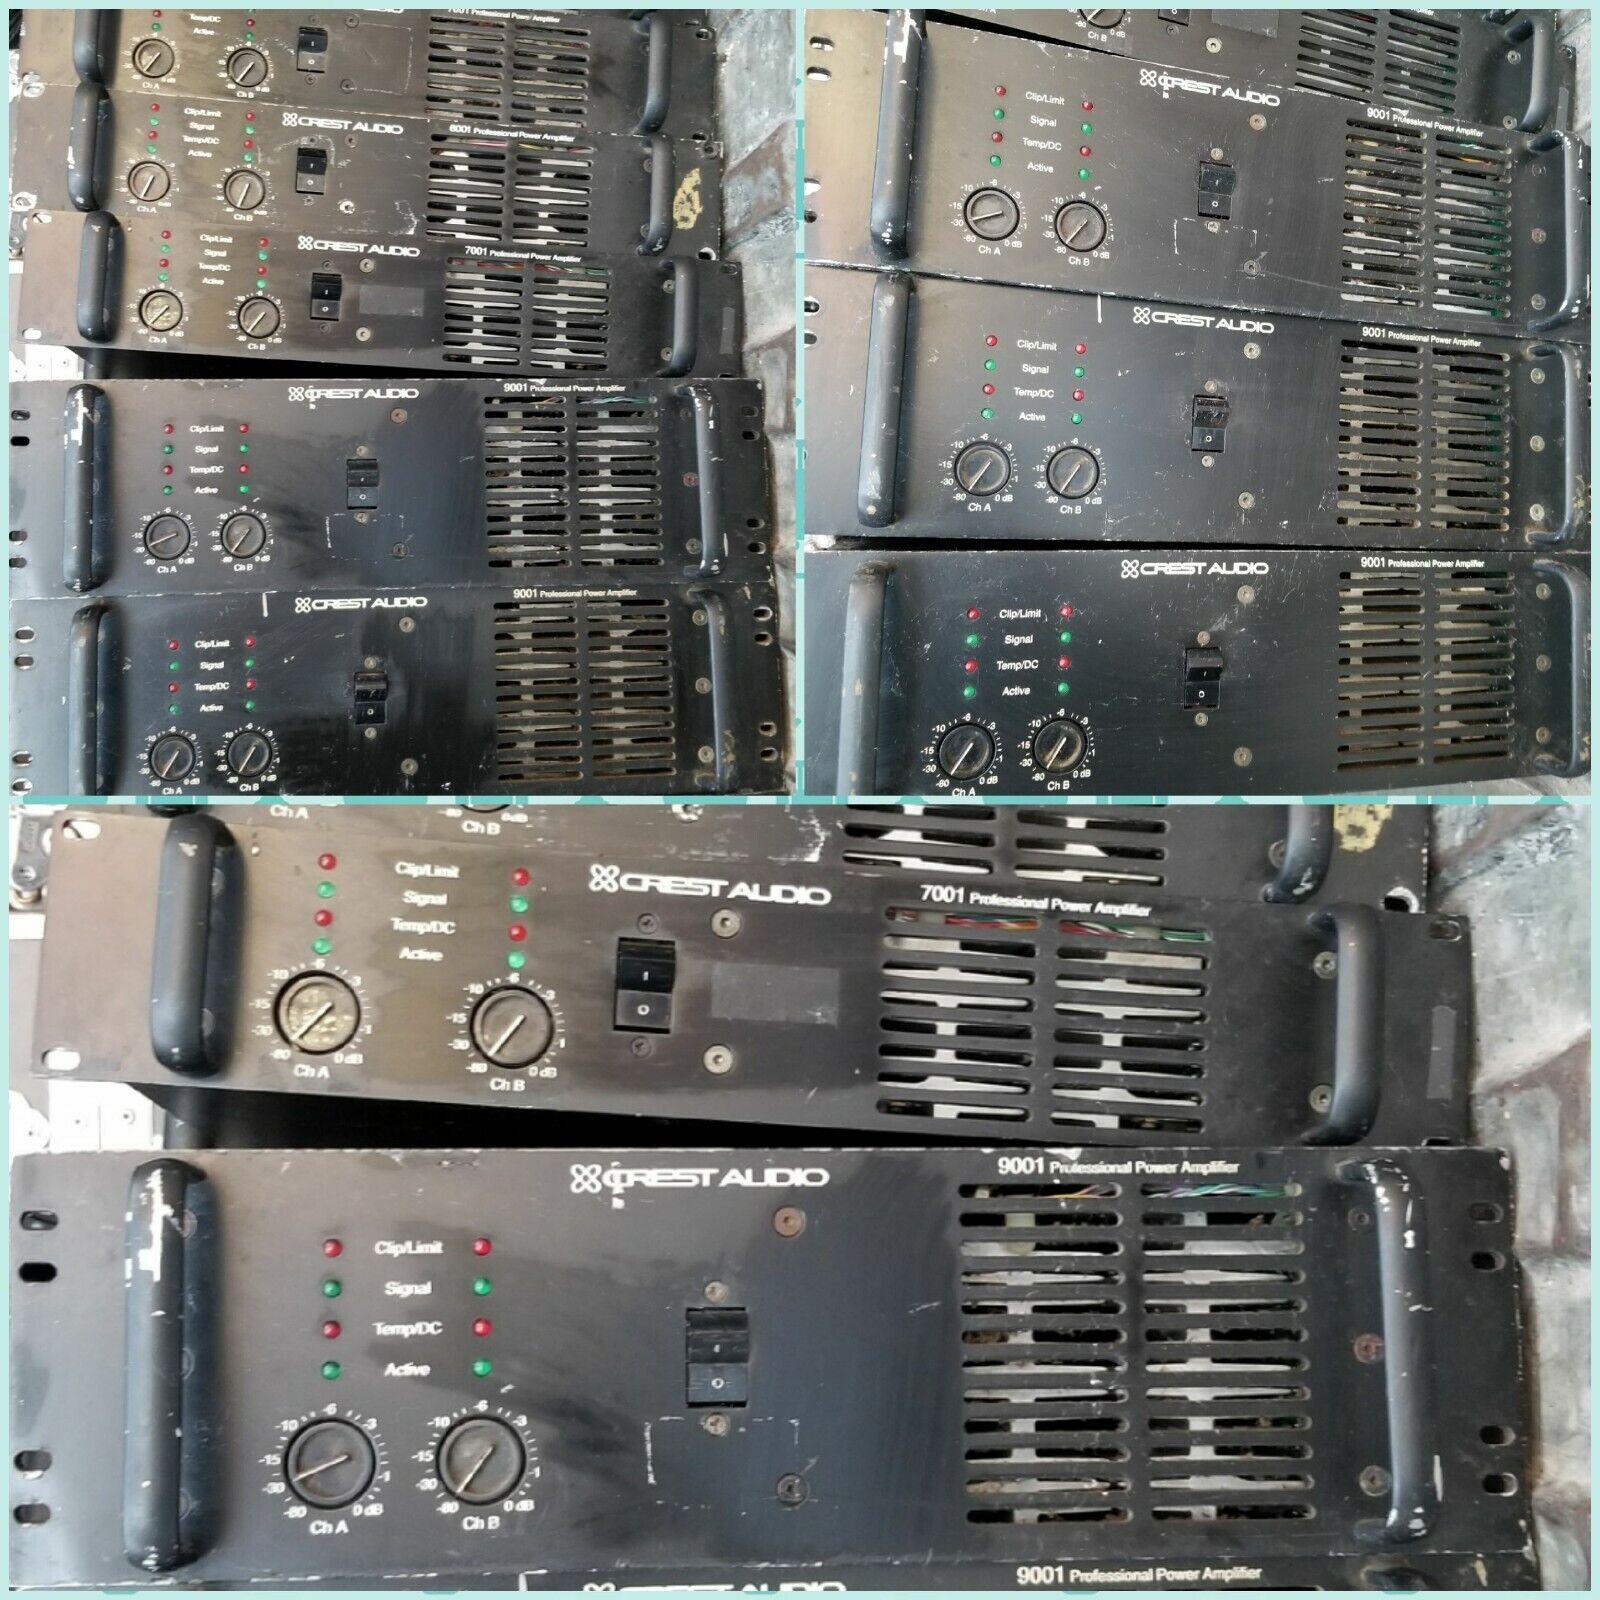 Crest Audio 9001 Power Amplifier 120Volt version